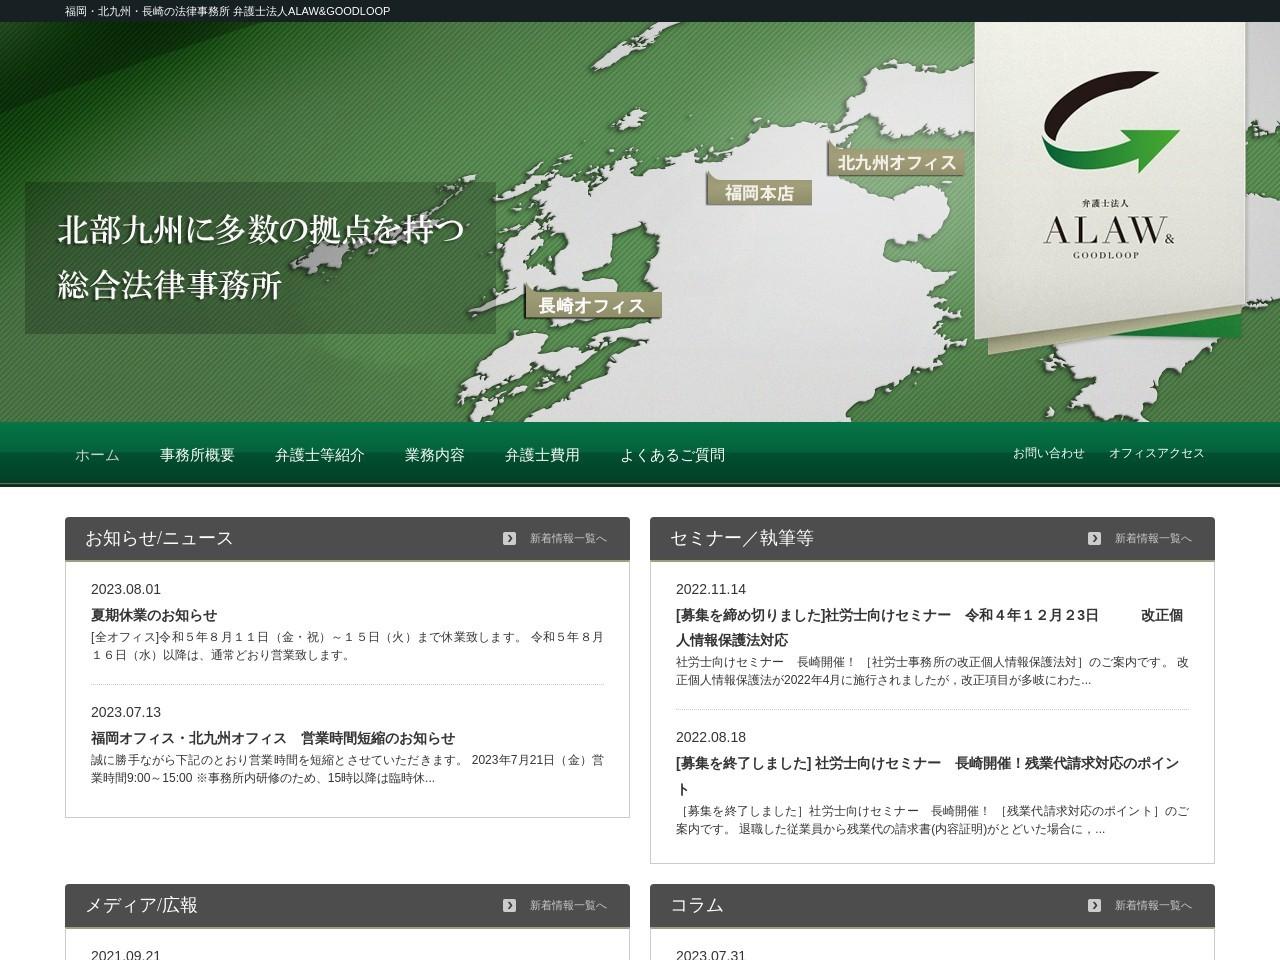 ALAW&GOODLOOP(弁護士法人)長崎オフィス